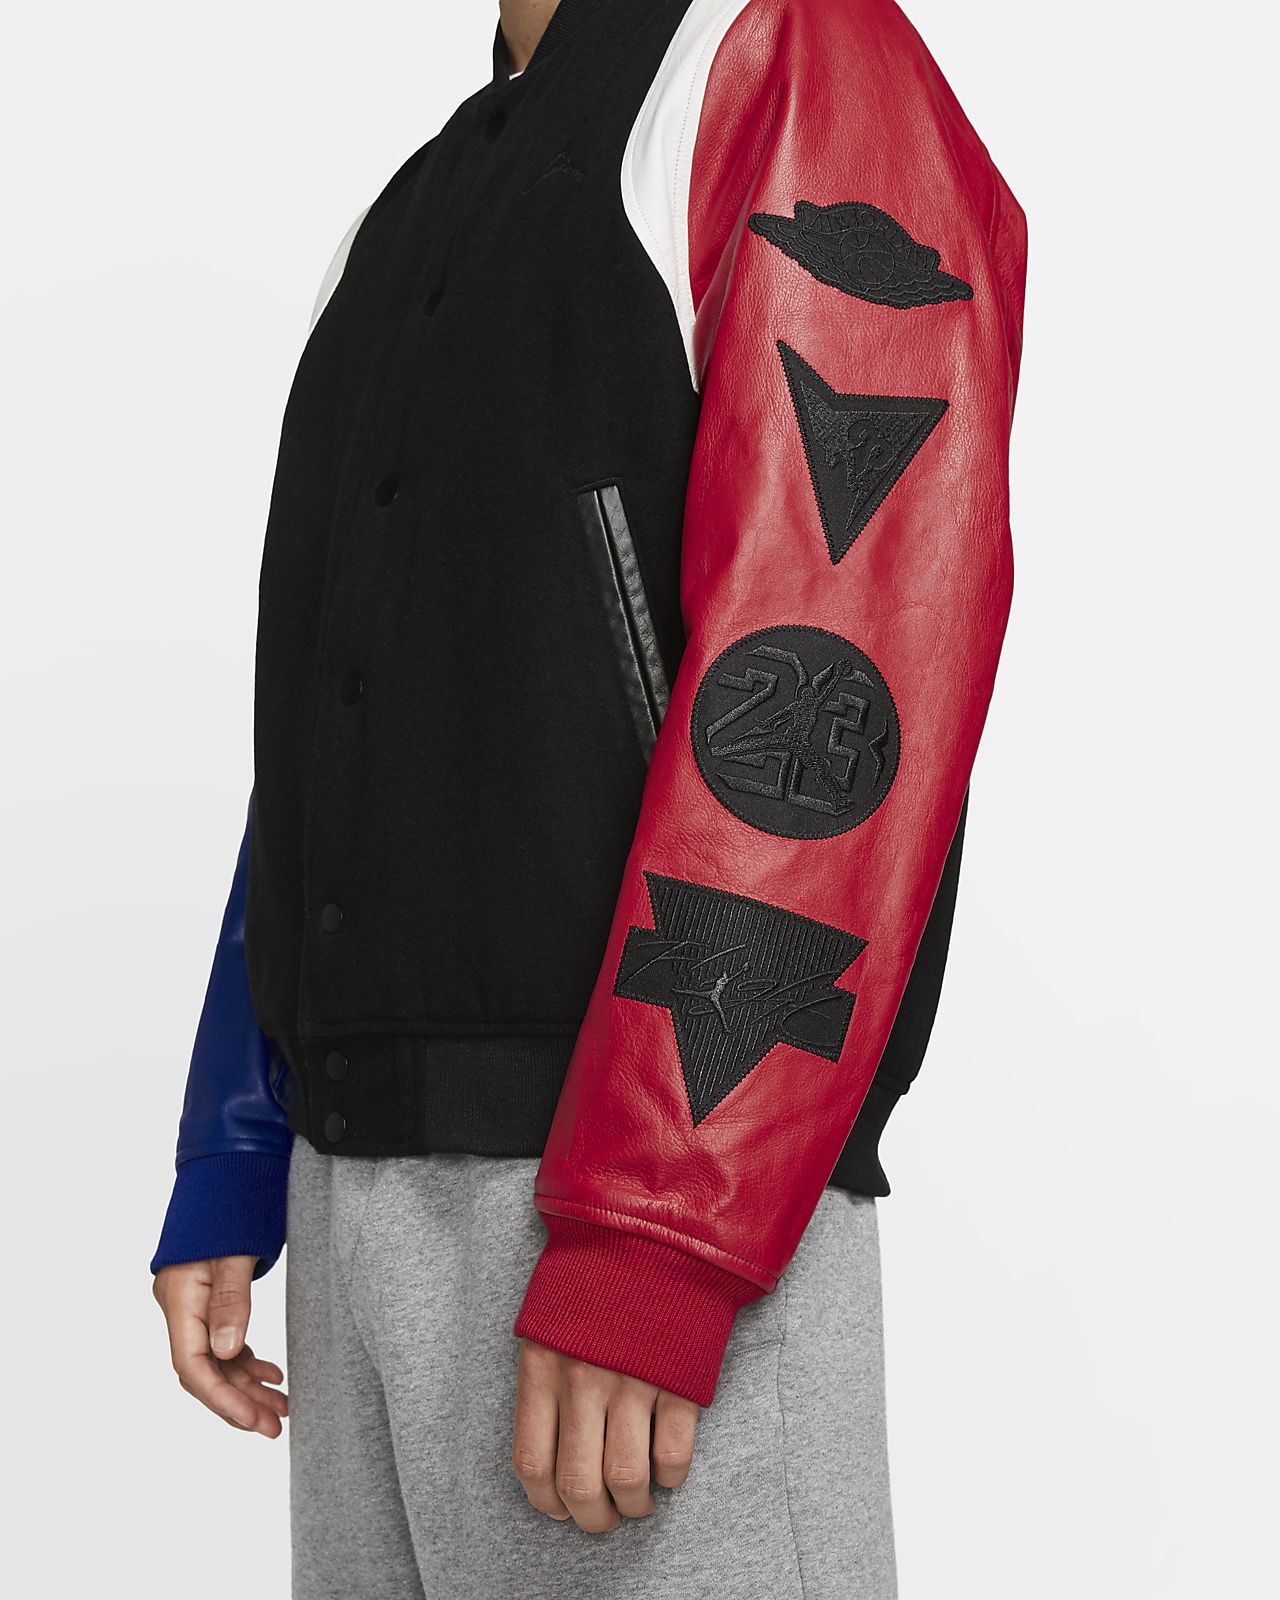 Nike Air Team Destroyer 3 Women's Lacrosse Cleats Black Size